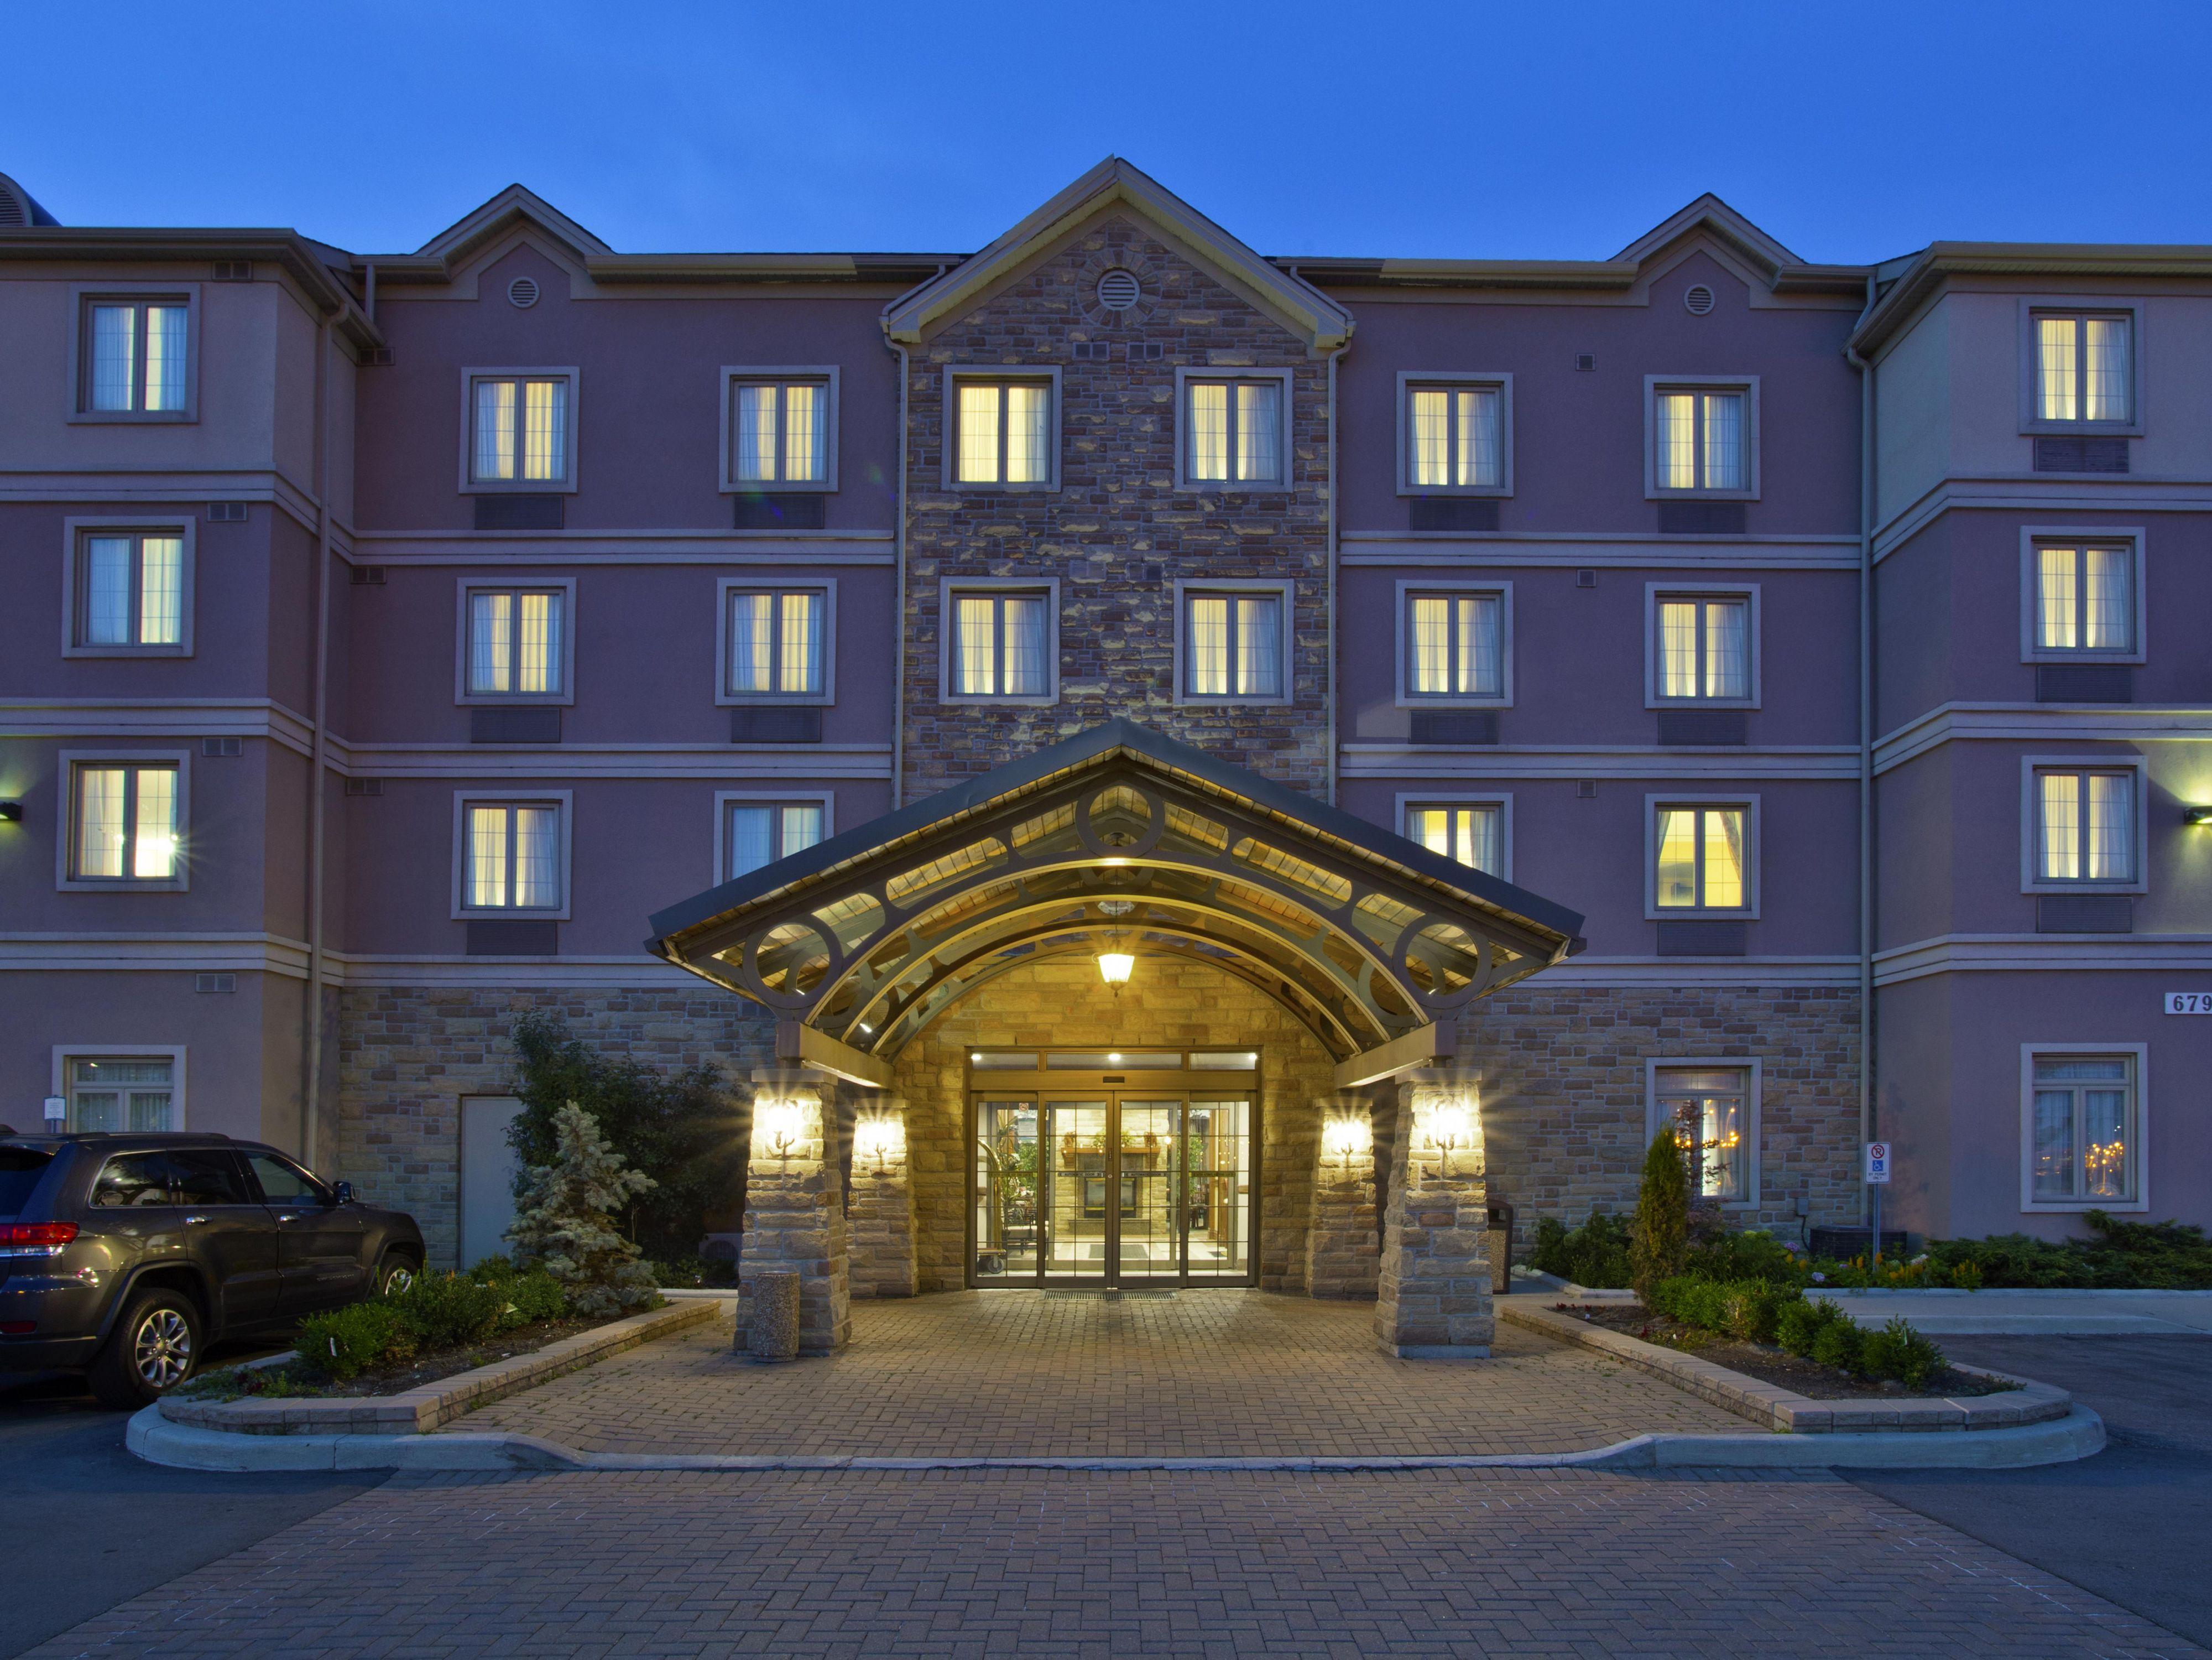 Derry Mississauga Toronto Brampton Escort Motel Hurantario